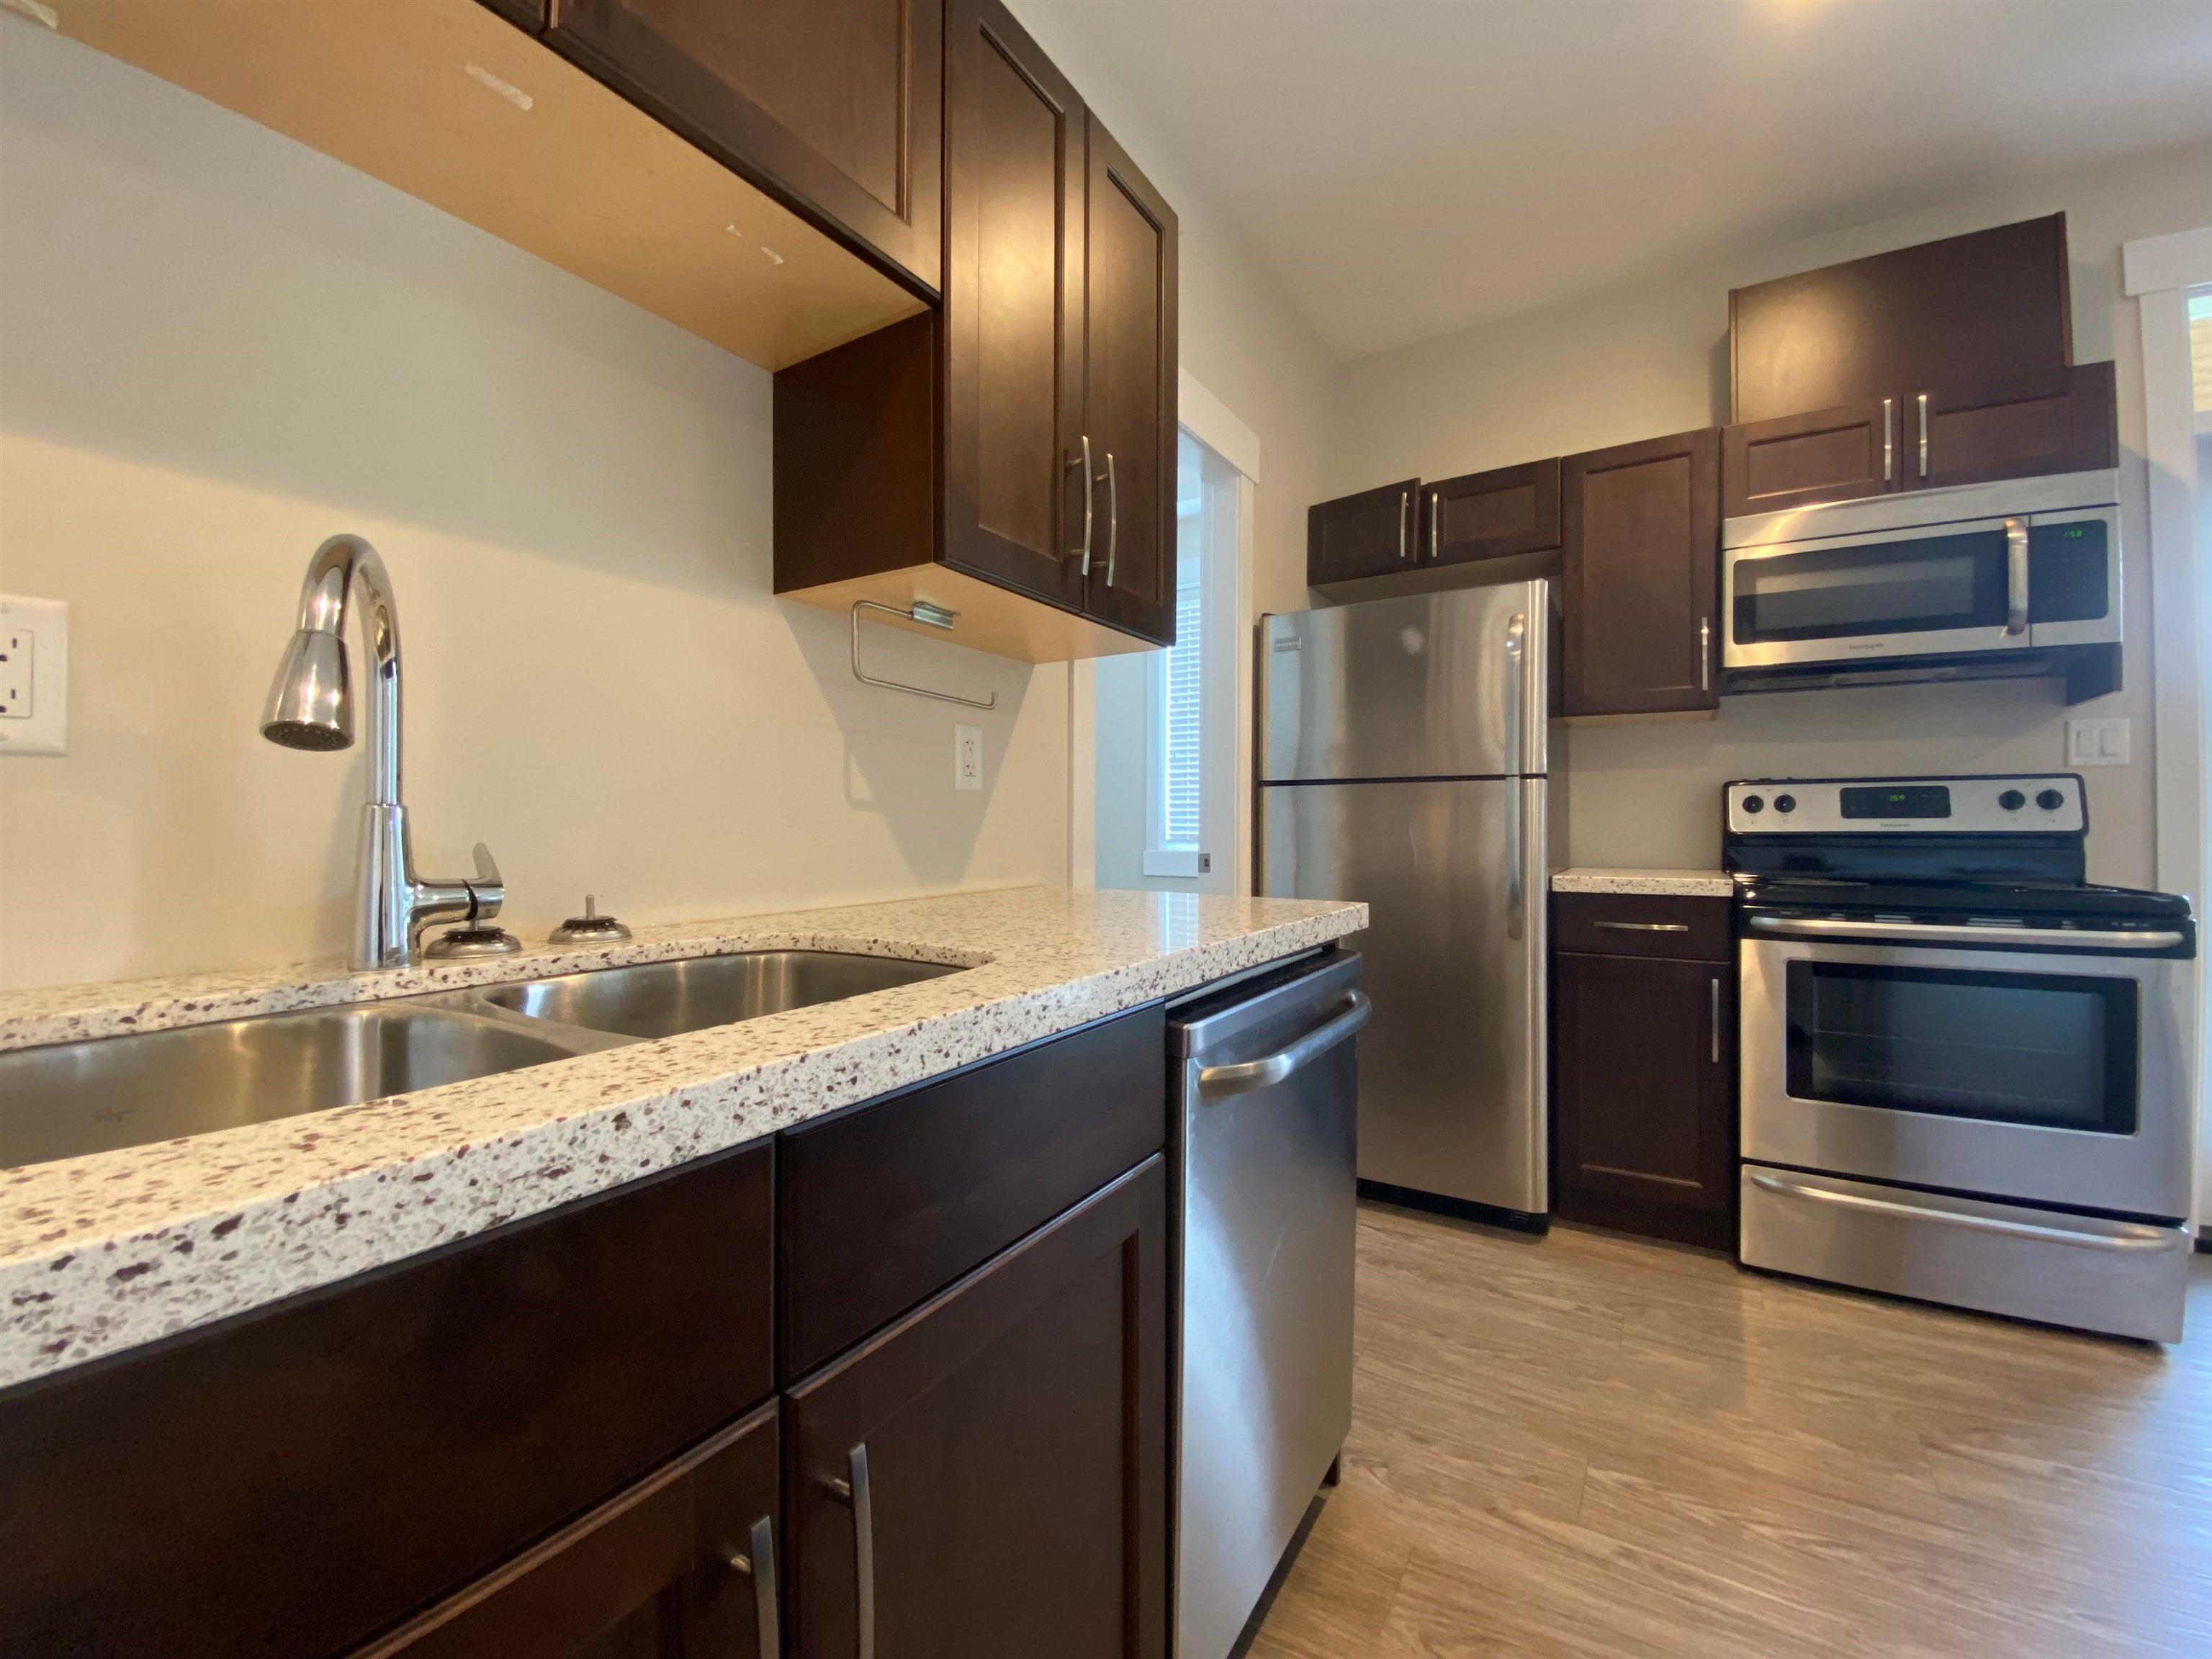 10144 KILLARNEY DRIVE - Fairfield Island House/Single Family for sale, 5 Bedrooms (R2625716) - #34